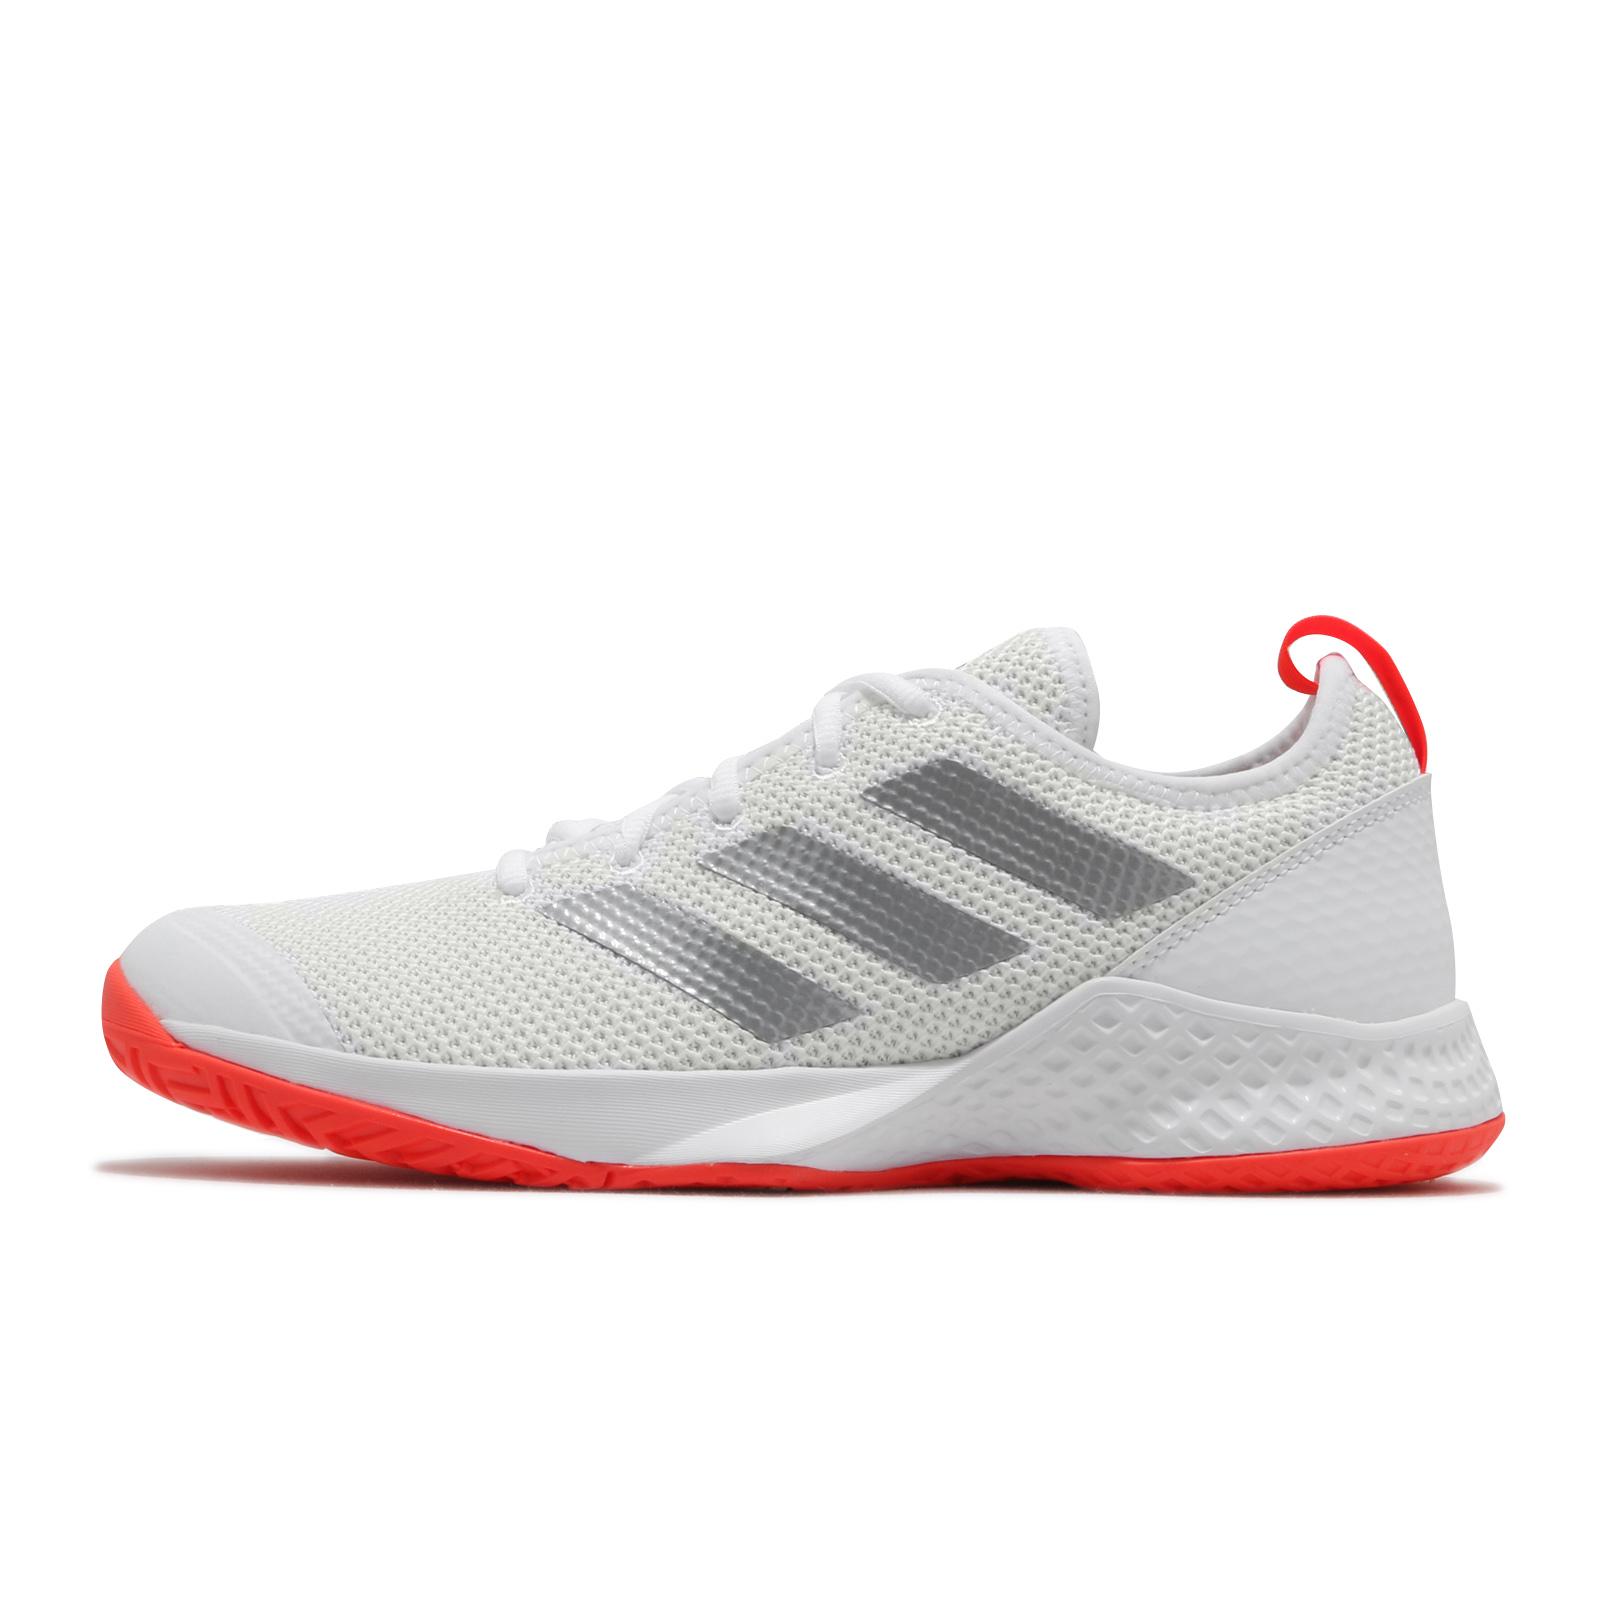 adidas 網球鞋 Court Control M 白 銀 橘 愛迪達 運動鞋 男鞋 【ACS】 FX7472